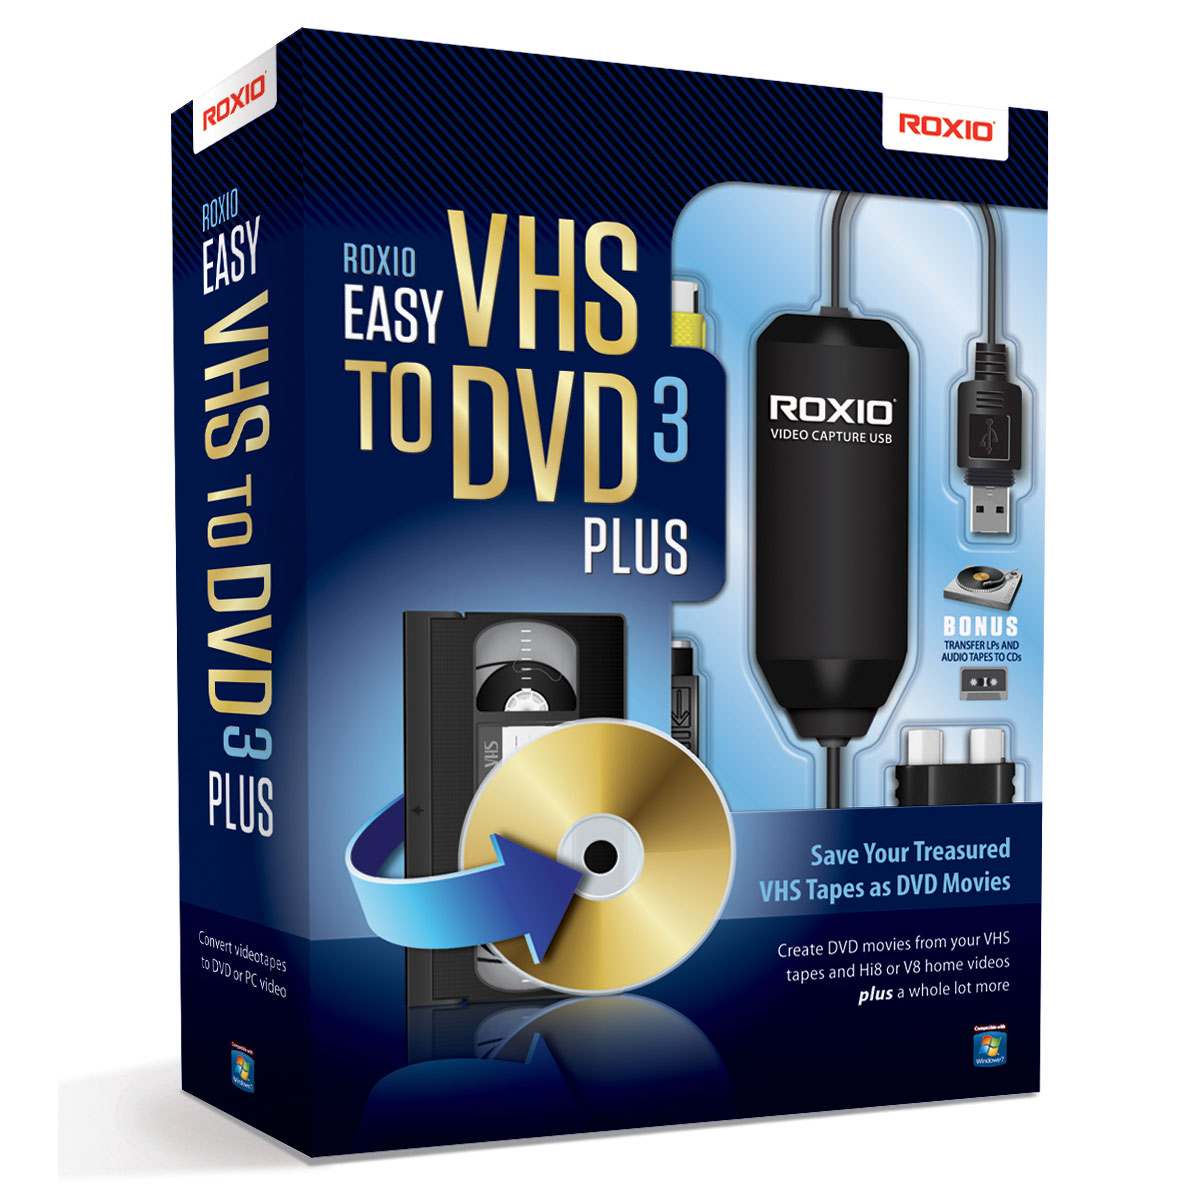 corel roxio easy vhs to dvd 3 plus logiciel image son corel sur. Black Bedroom Furniture Sets. Home Design Ideas